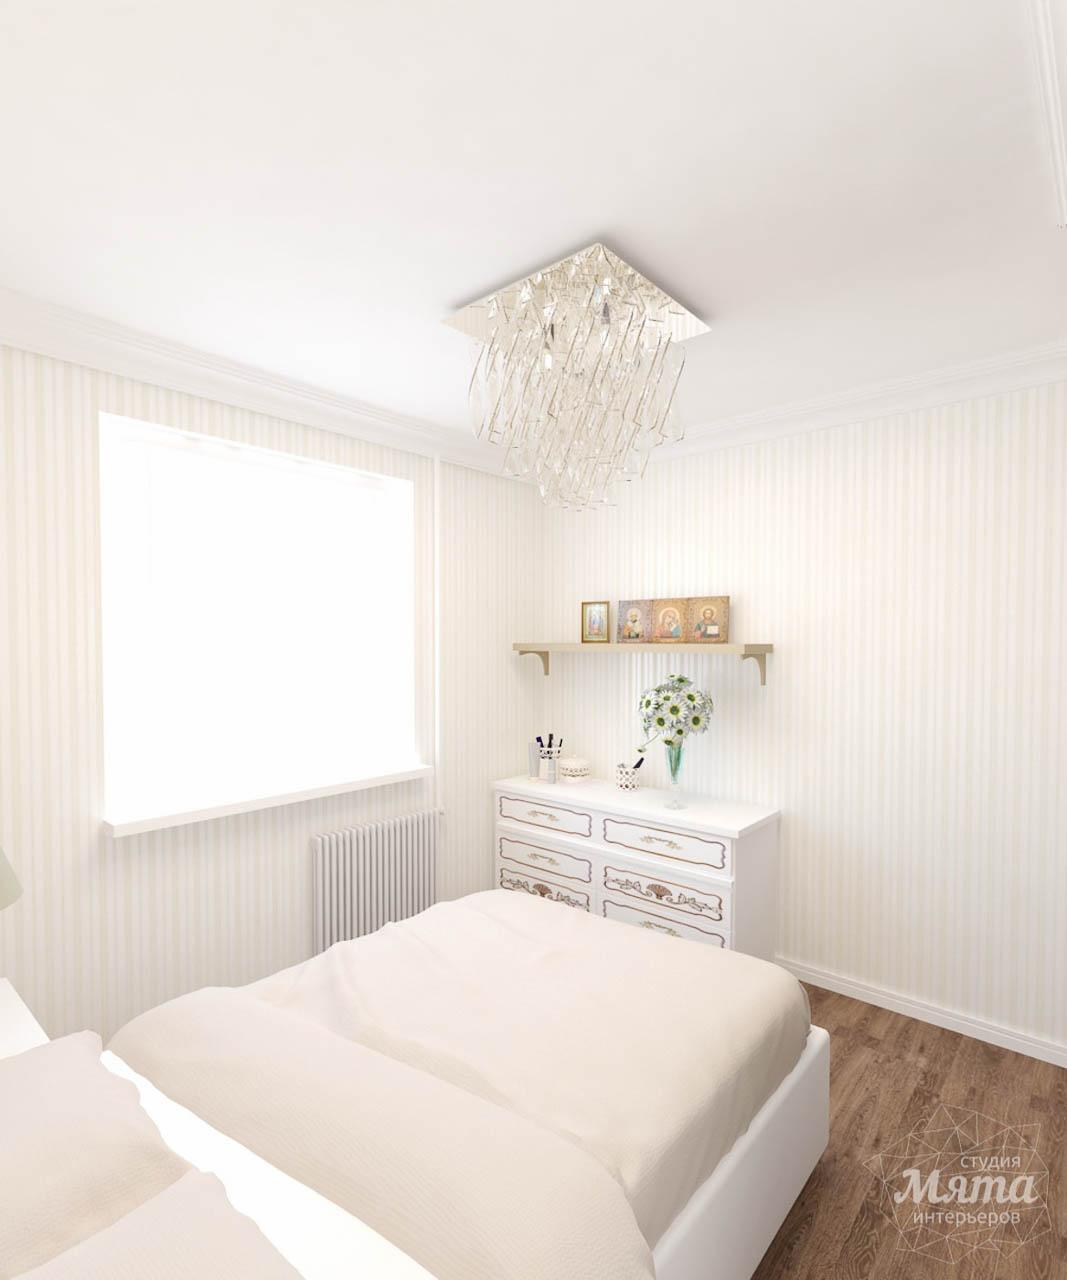 Дизайн интерьера и ремонт однокомнатной квартиры по ул. Бажова 134 img594705079